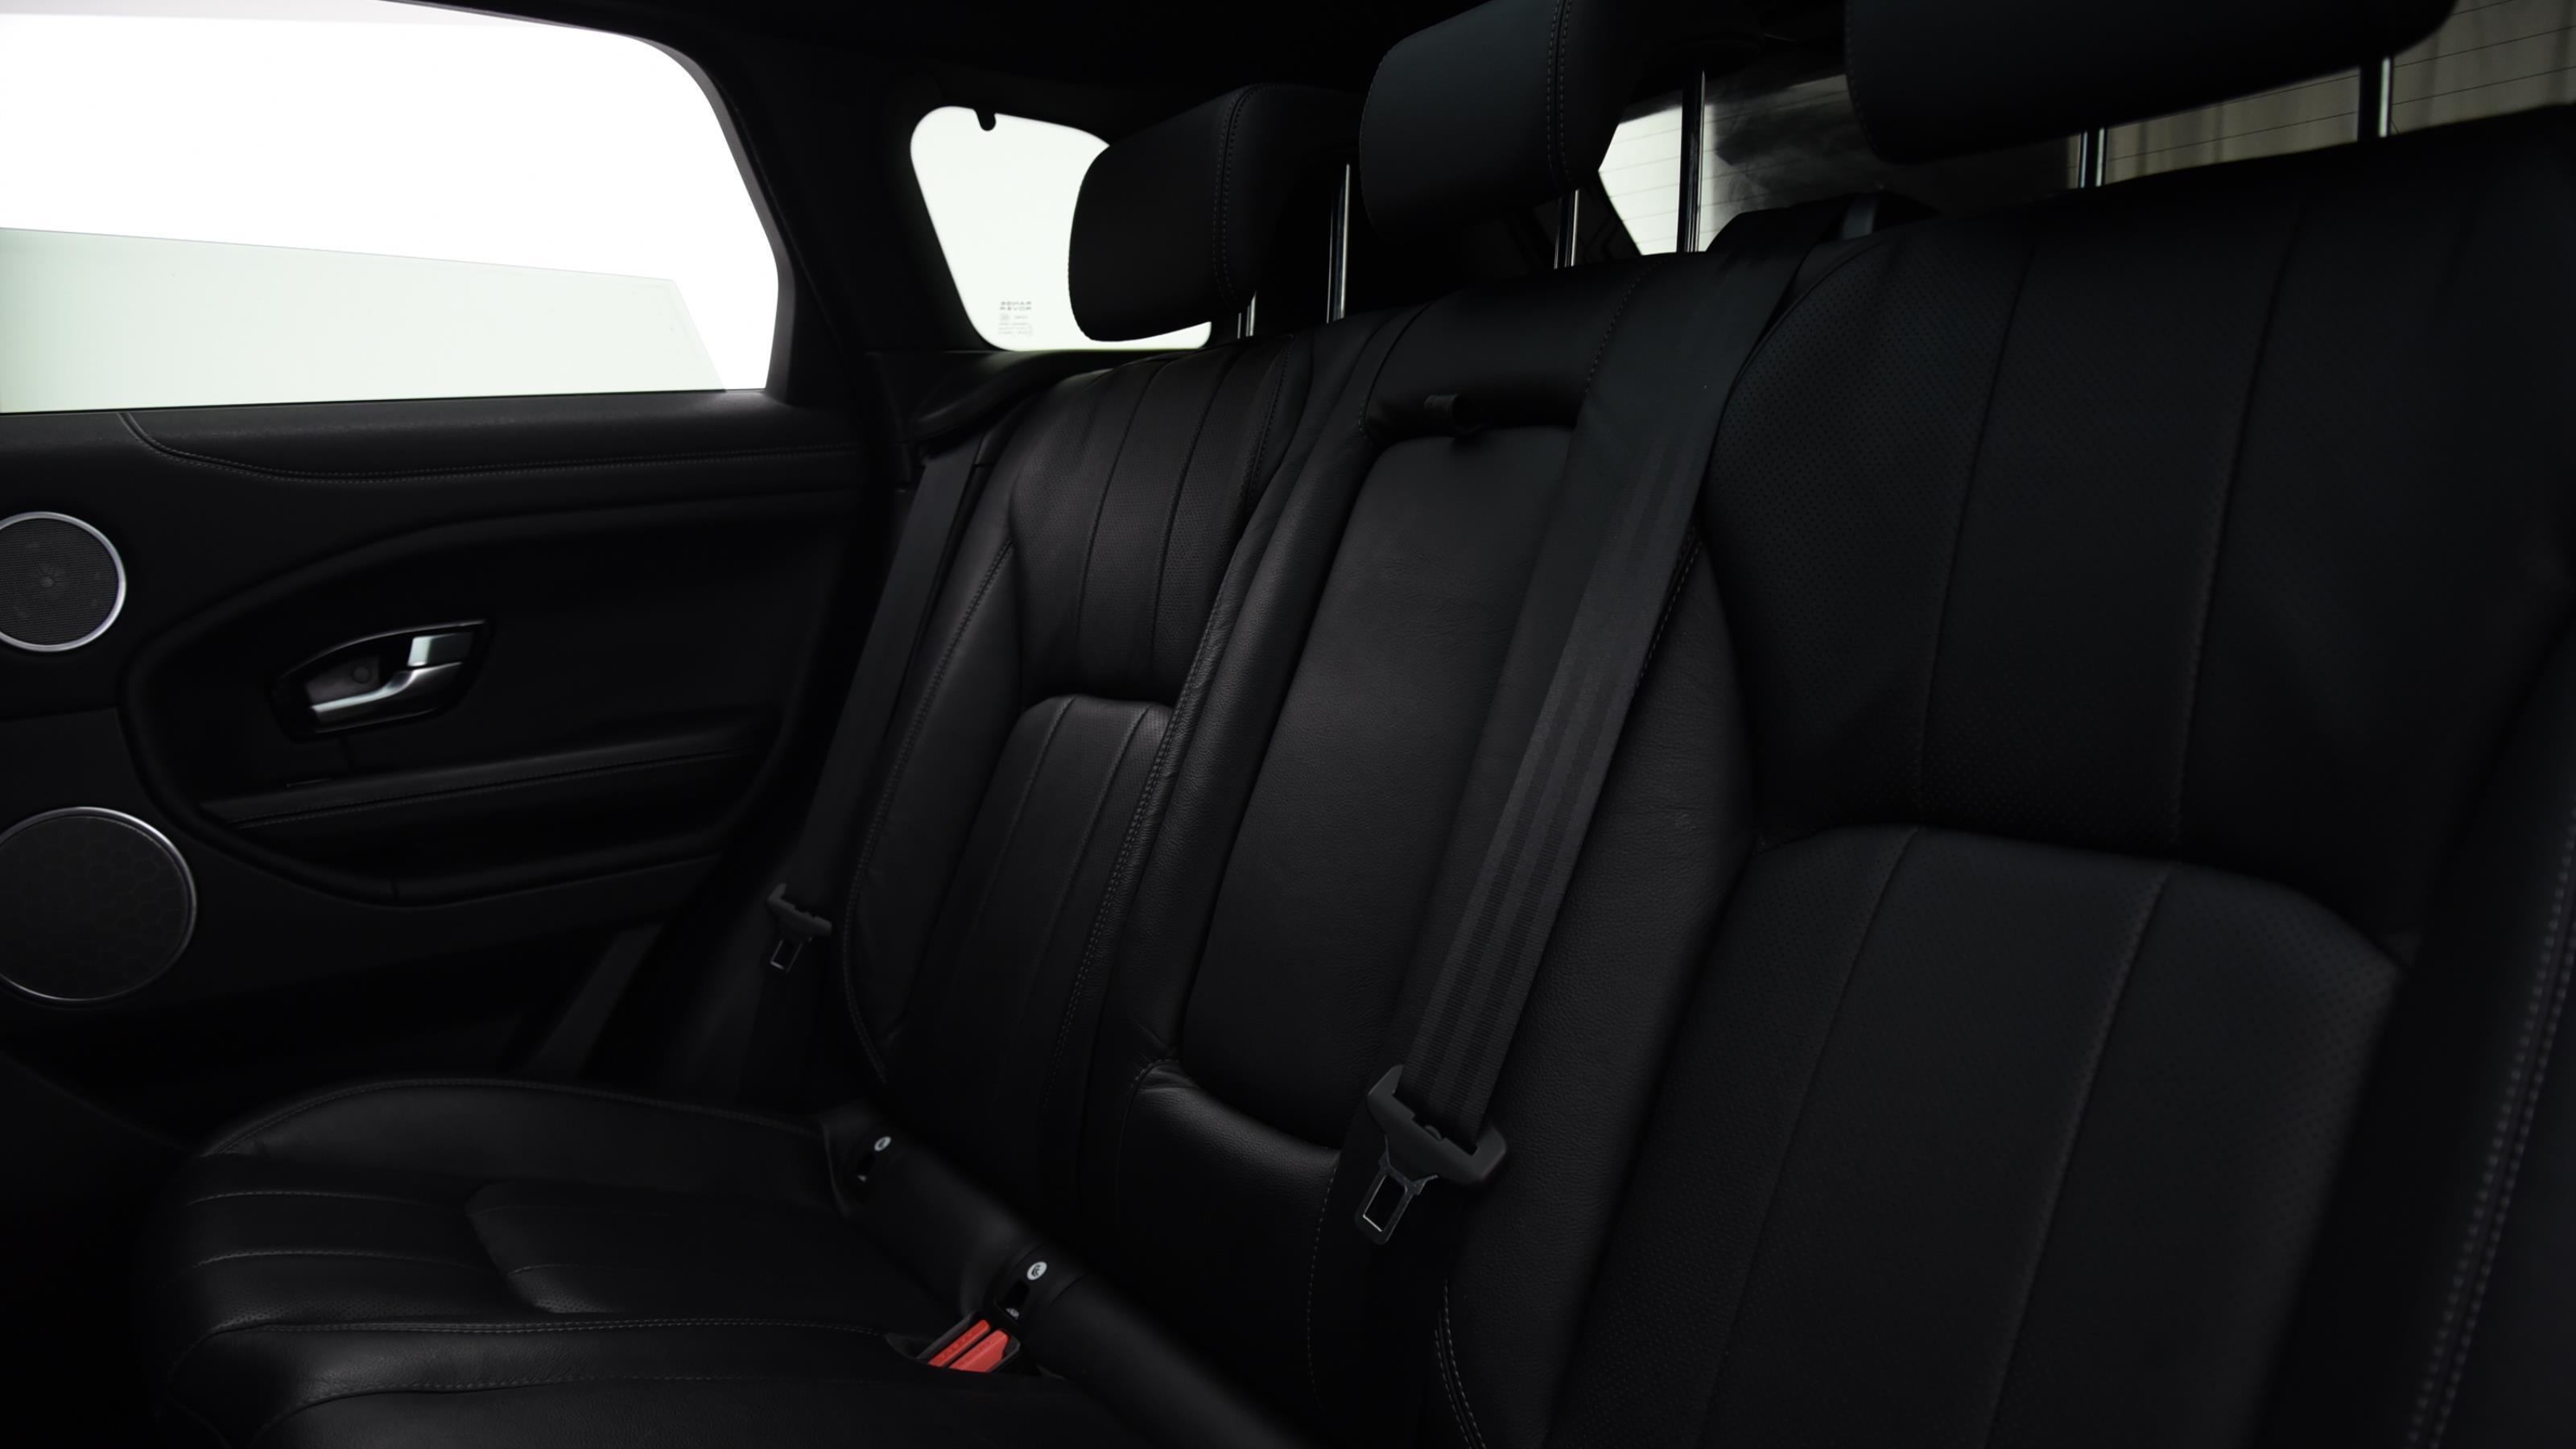 Used 2015 Land Rover RANGE ROVER EVOQUE 2.0 TD4 SE Tech 5dr Auto GREY at Saxton4x4